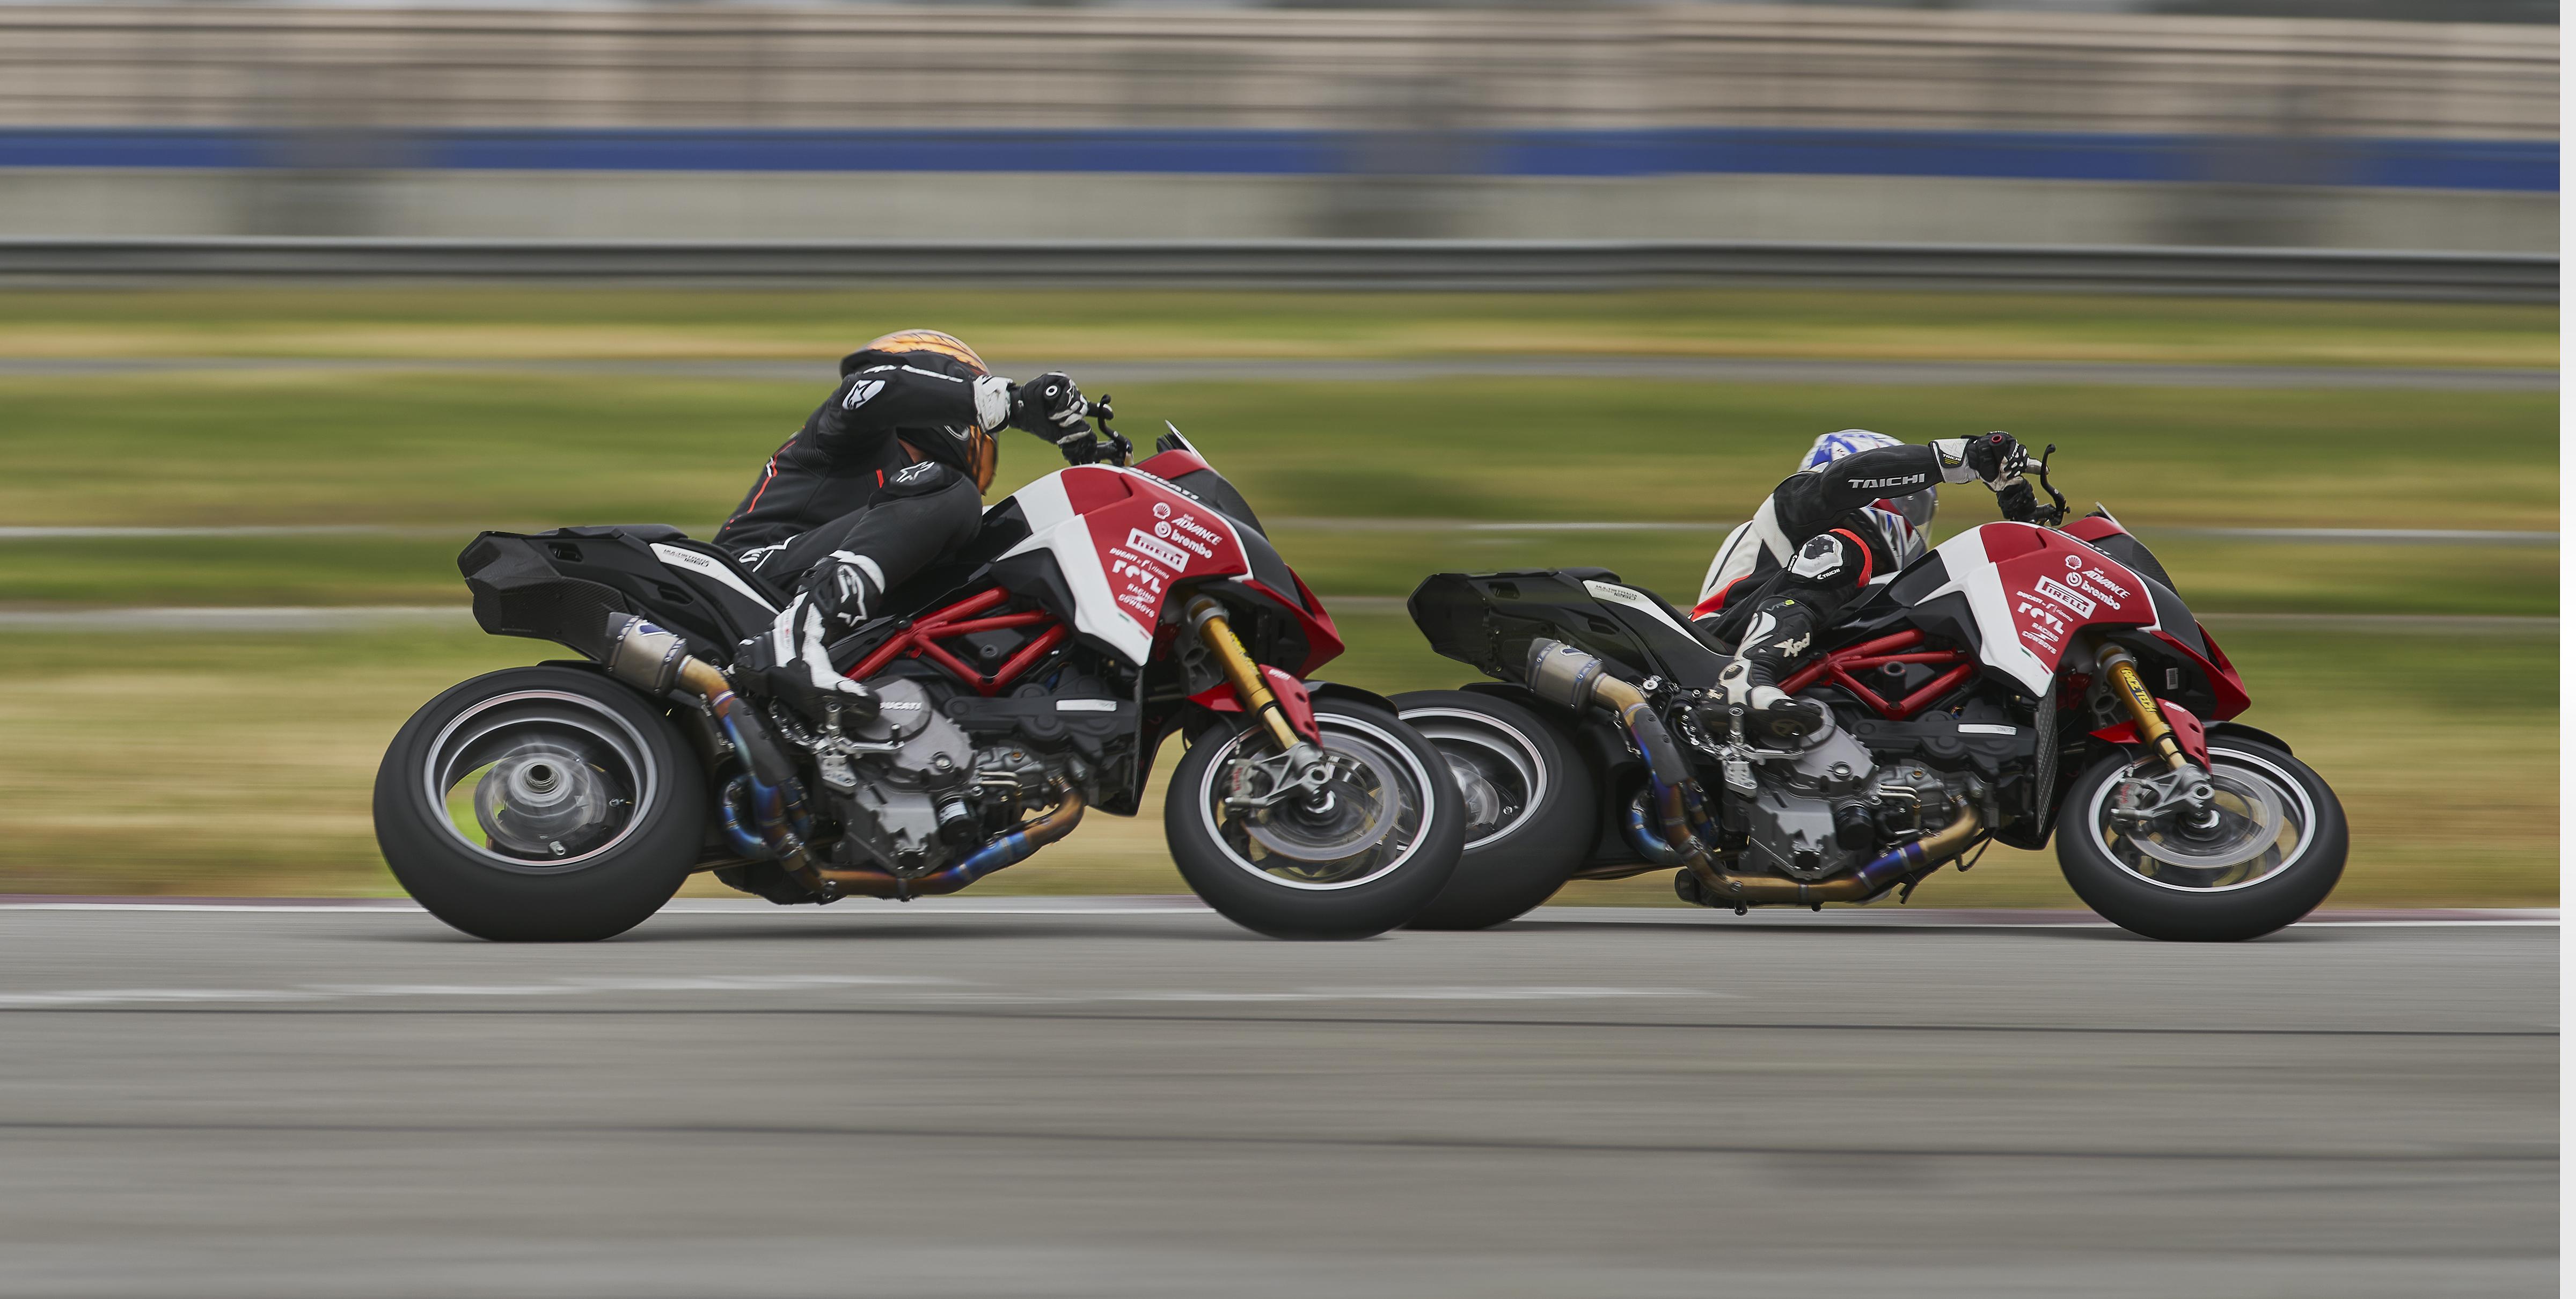 Spider Grips Ducati Pikes Peak Track1 Practice